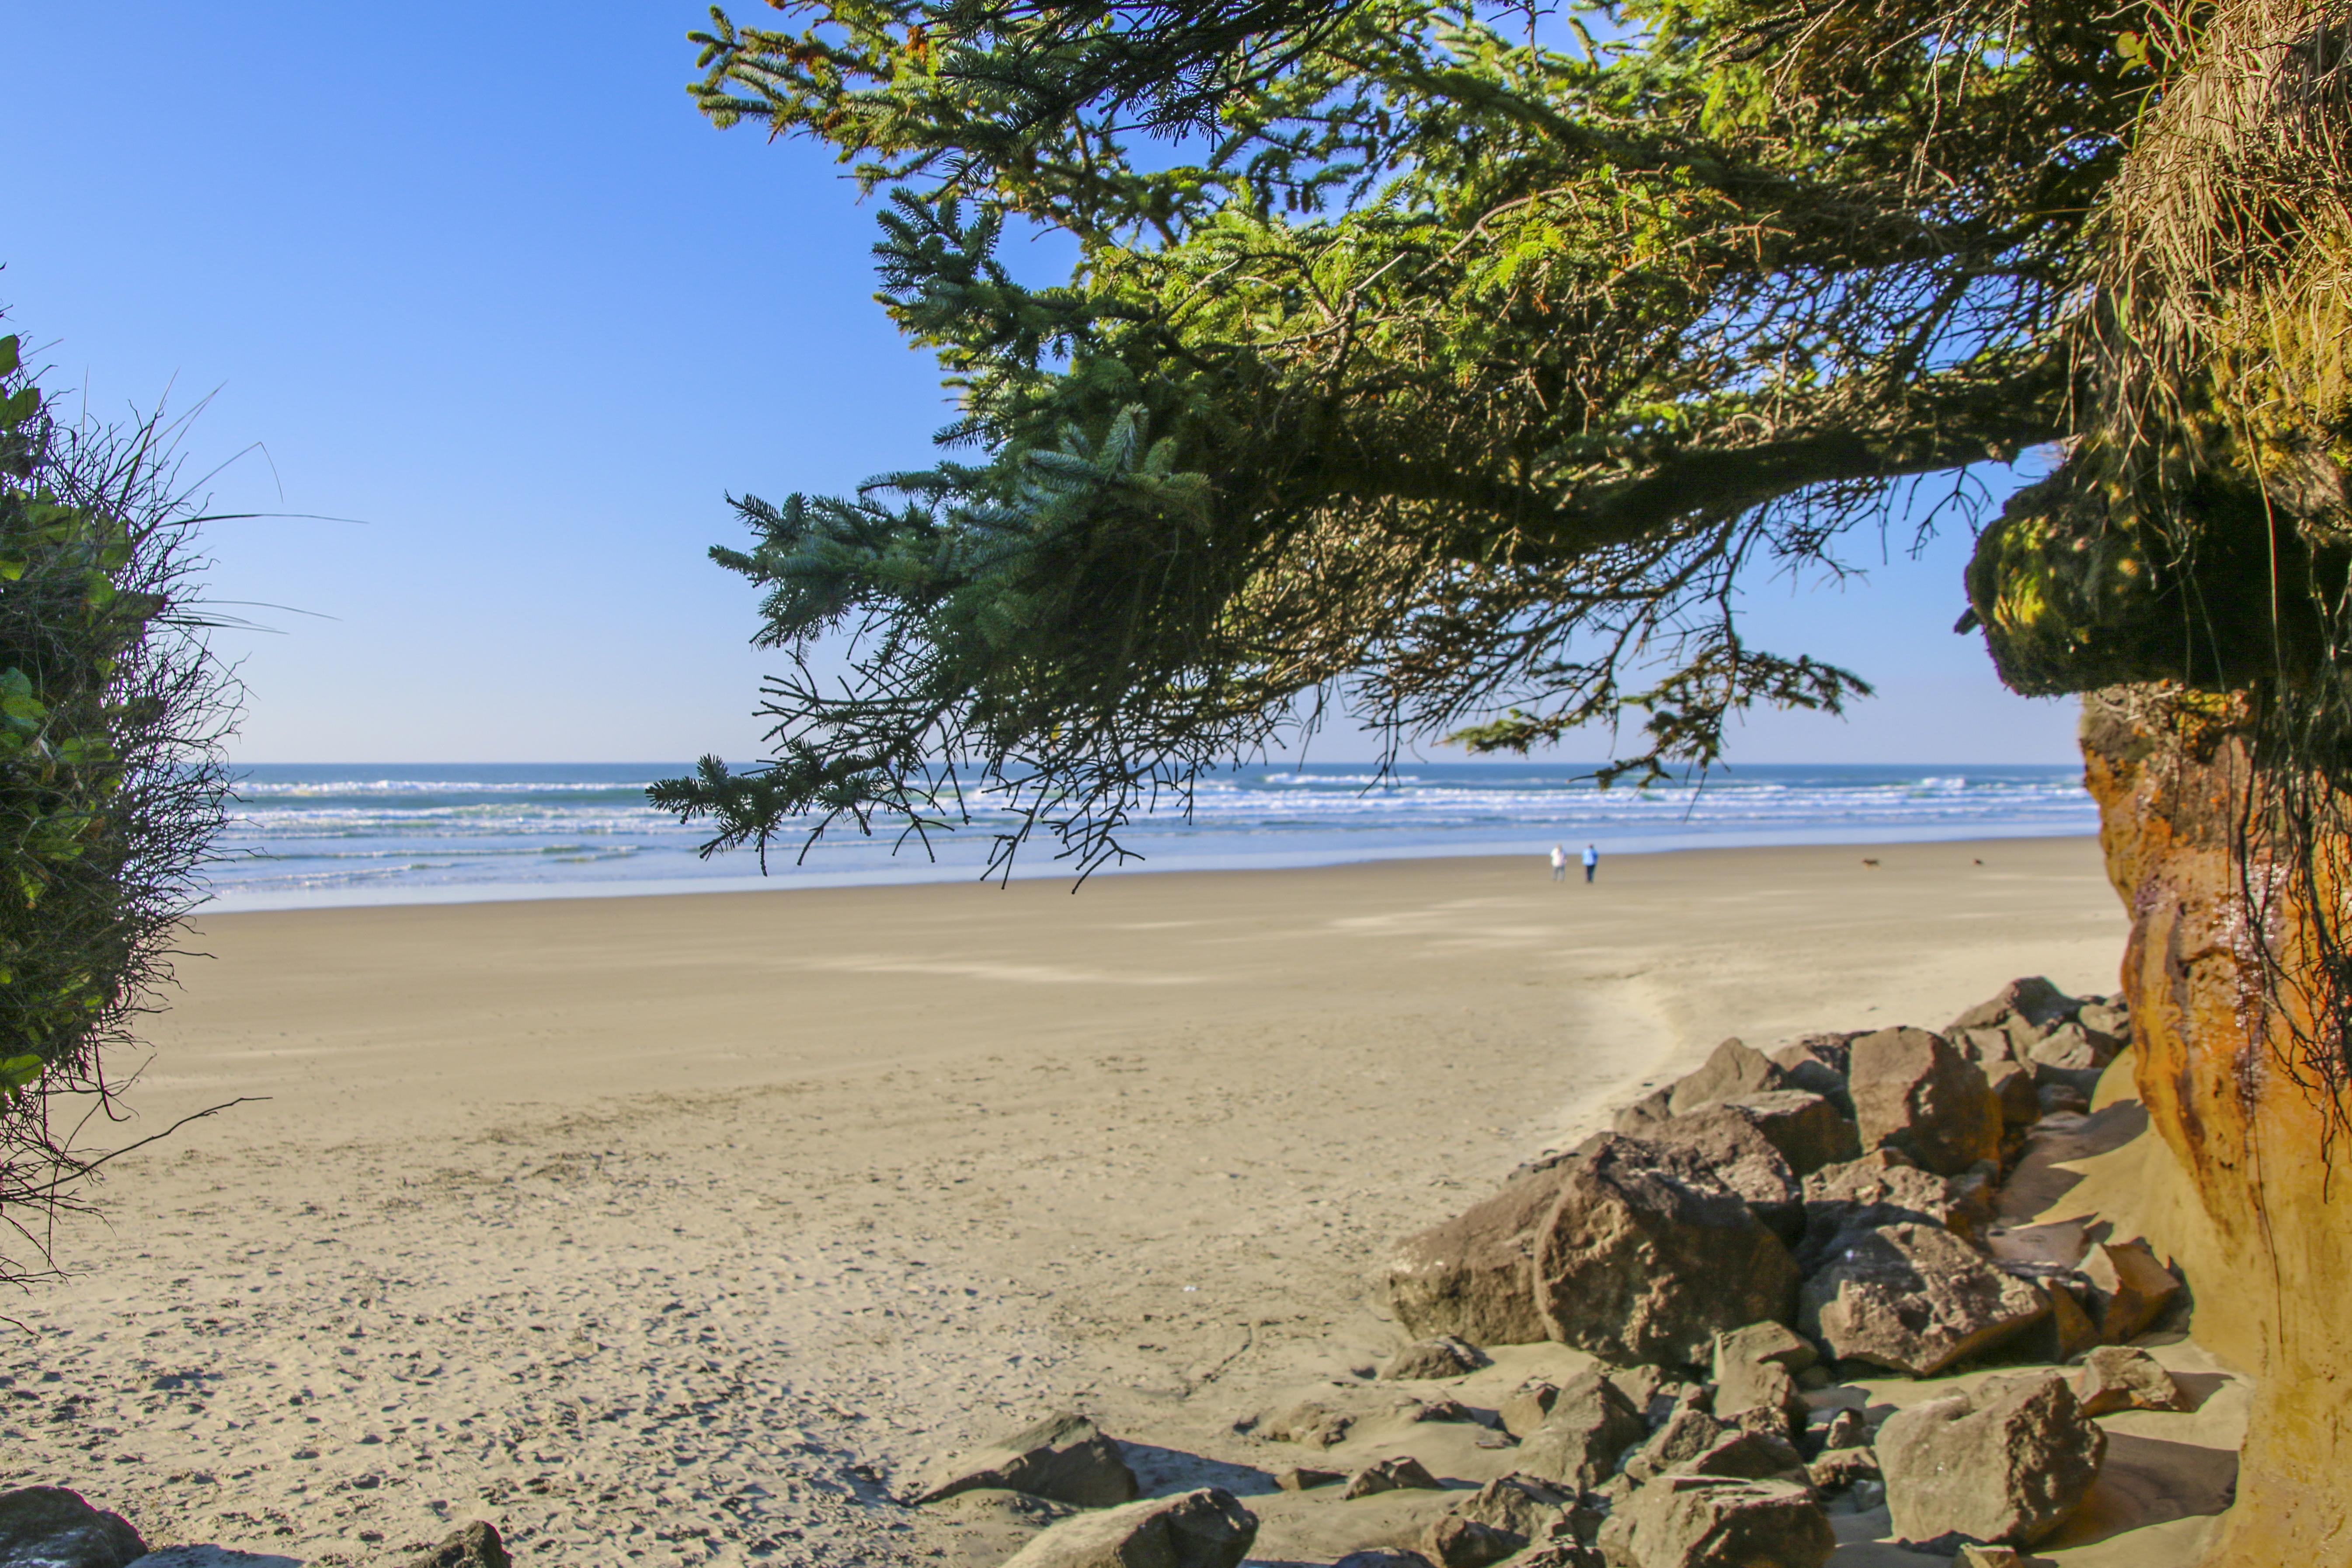 Tillicum beach sstate park, oregon photo